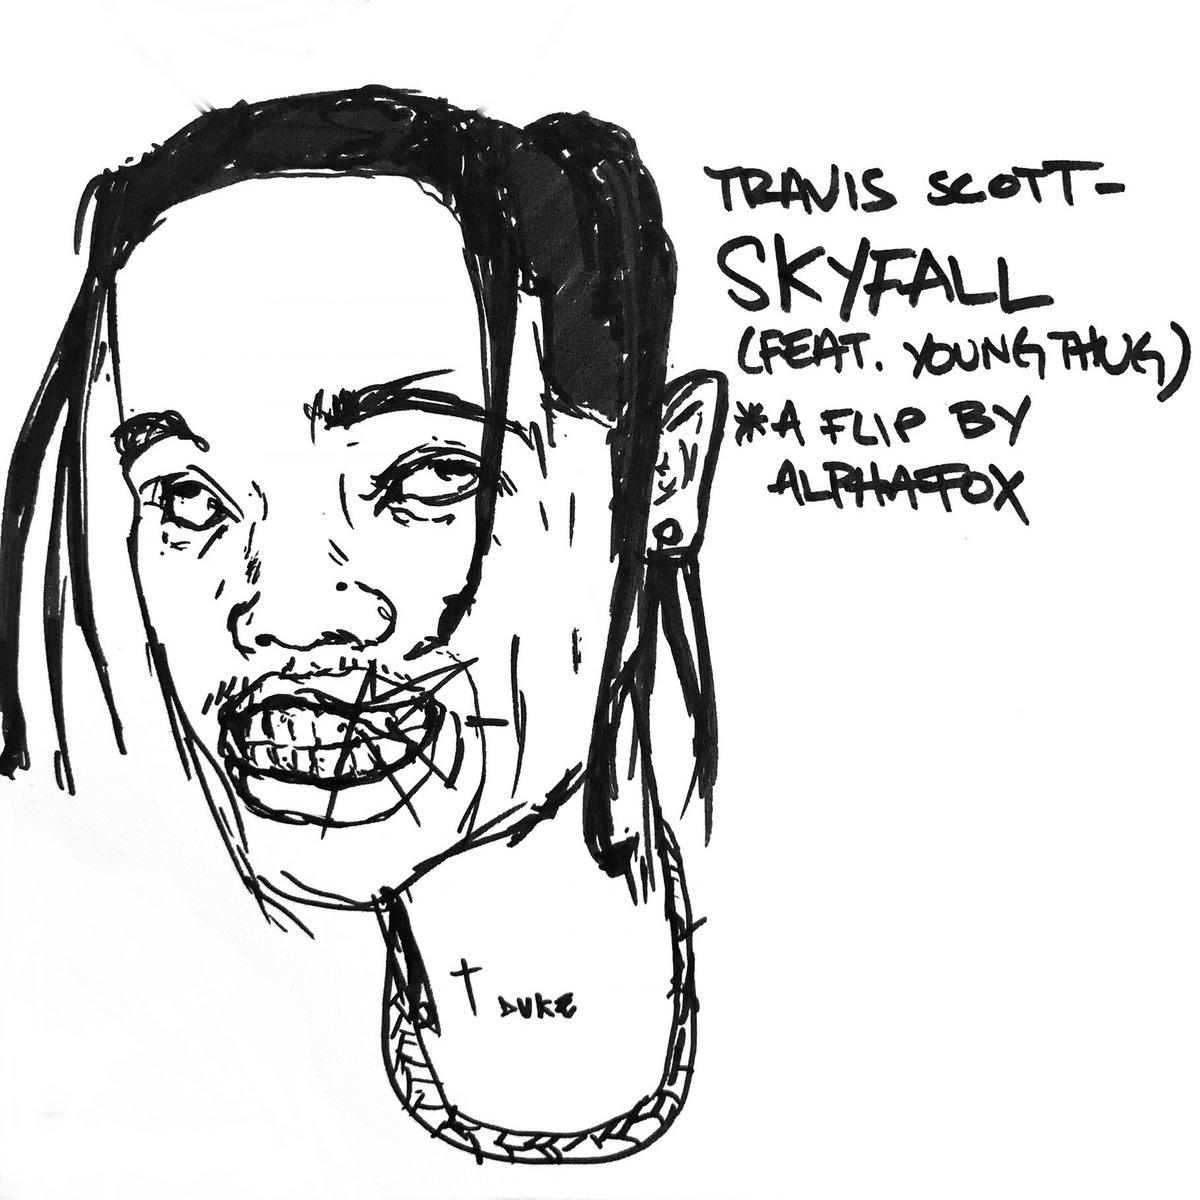 Travis Scott - Skyfall (Feat  Young Thug) *a flip by